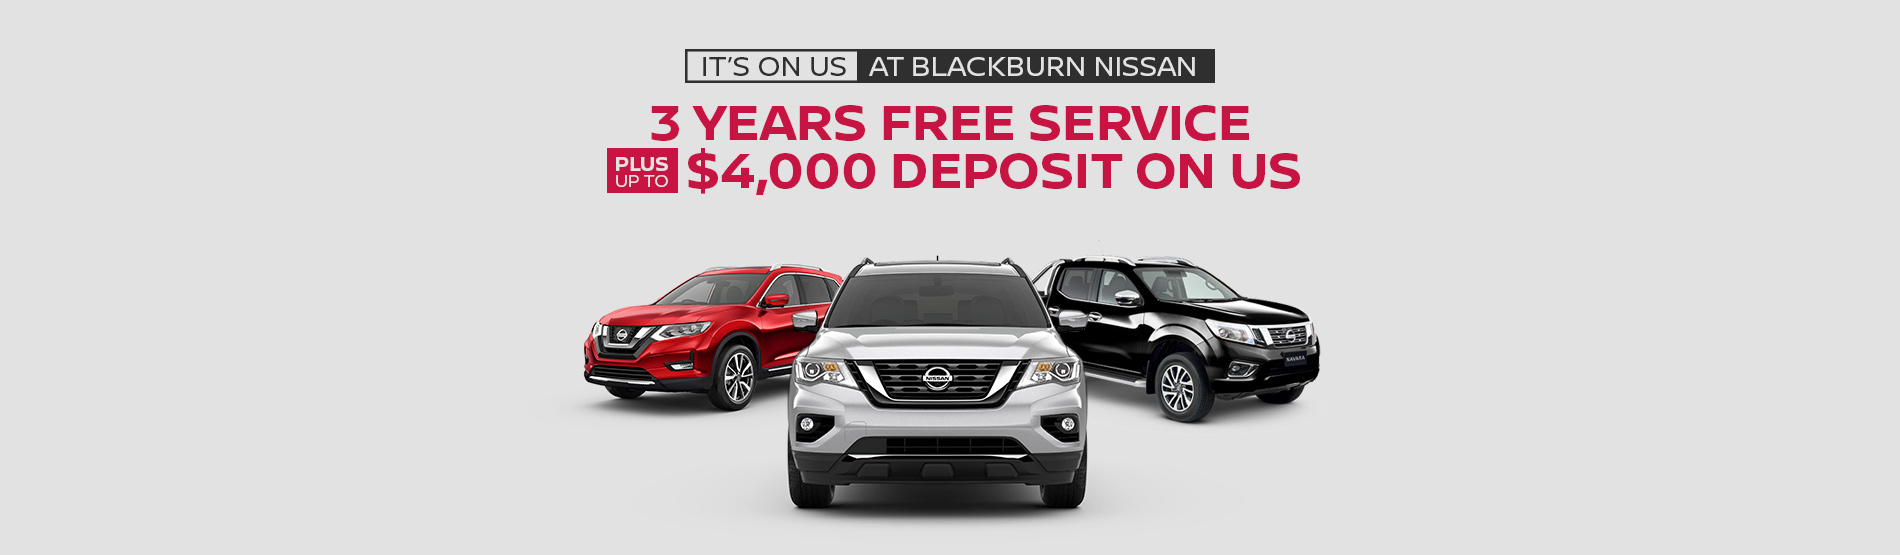 Blackburn Nissan Offer